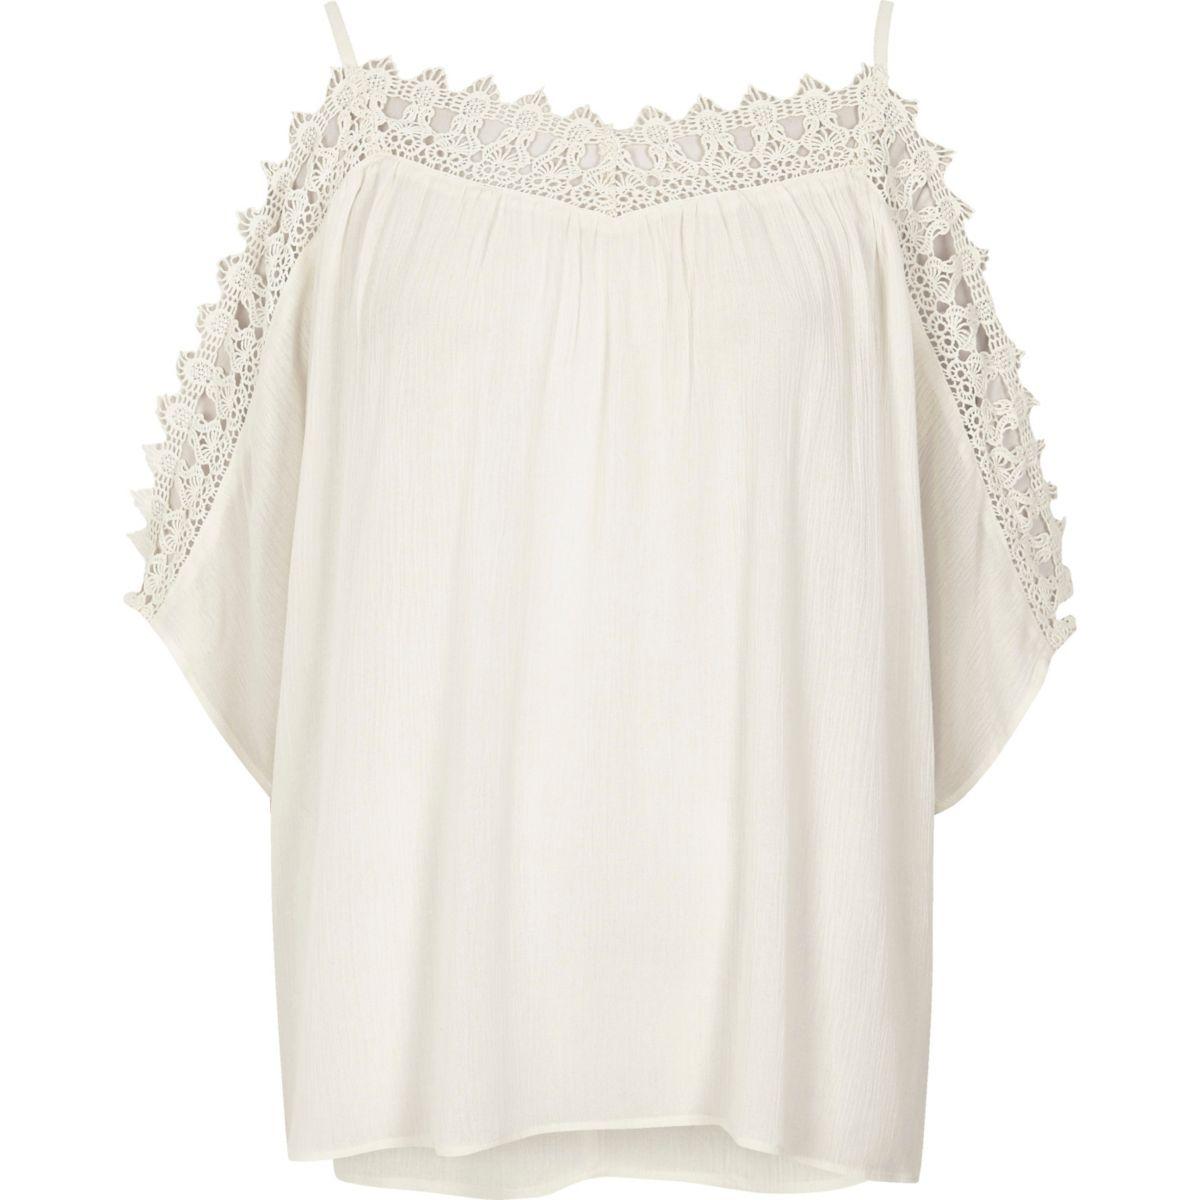 Cream crochet cold shoulder top